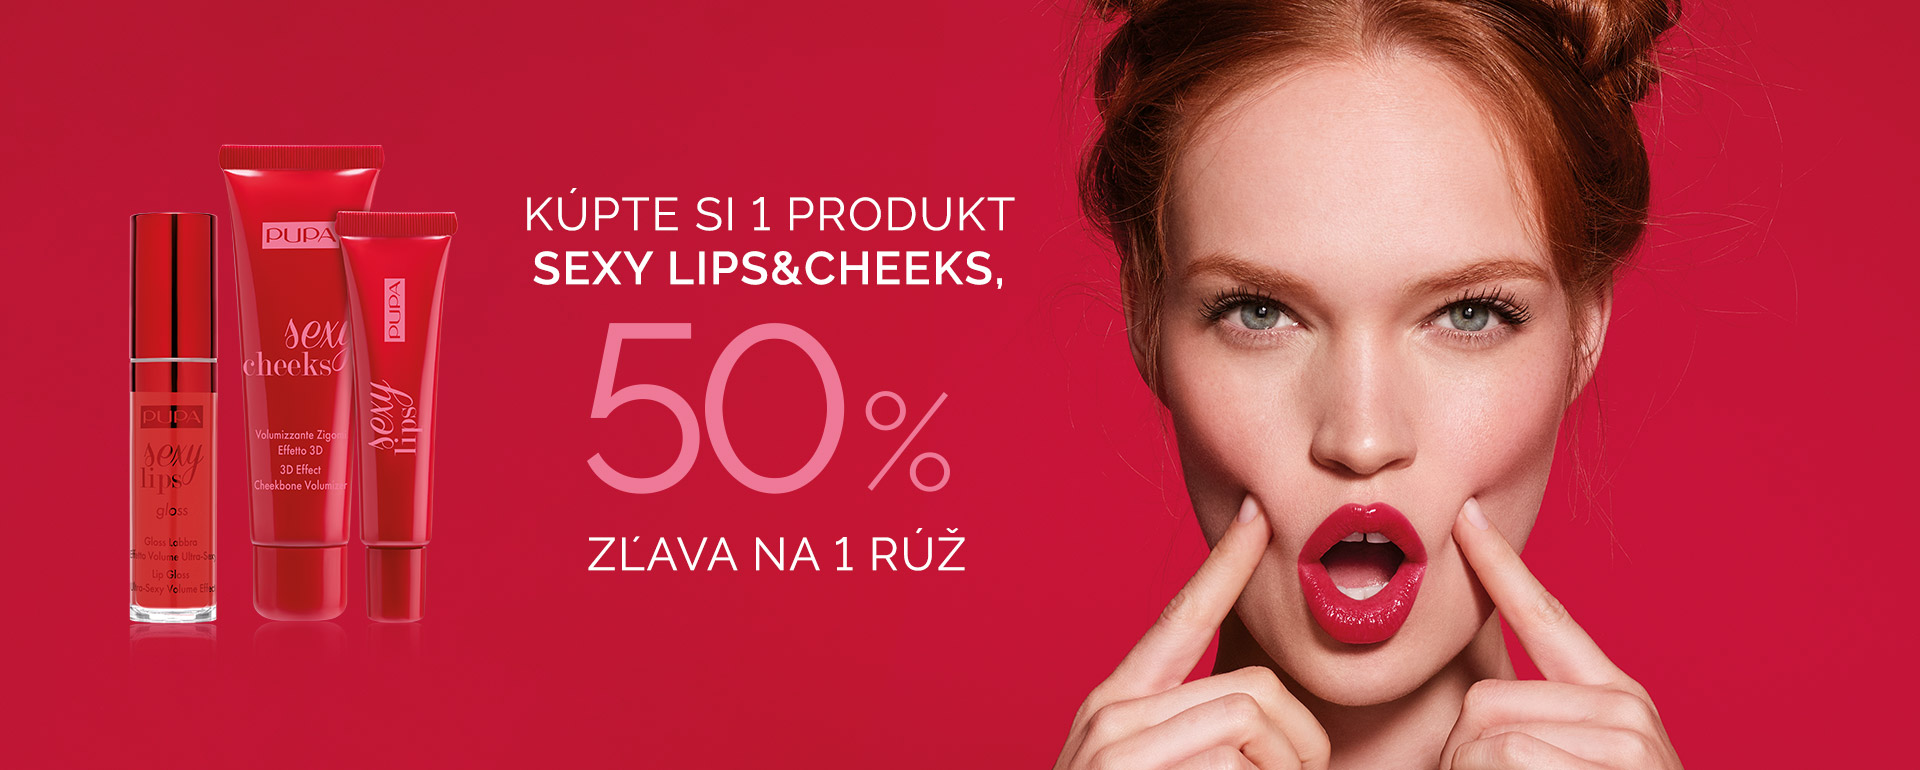 Sexy Lips&Cheecks - PUPA Milano